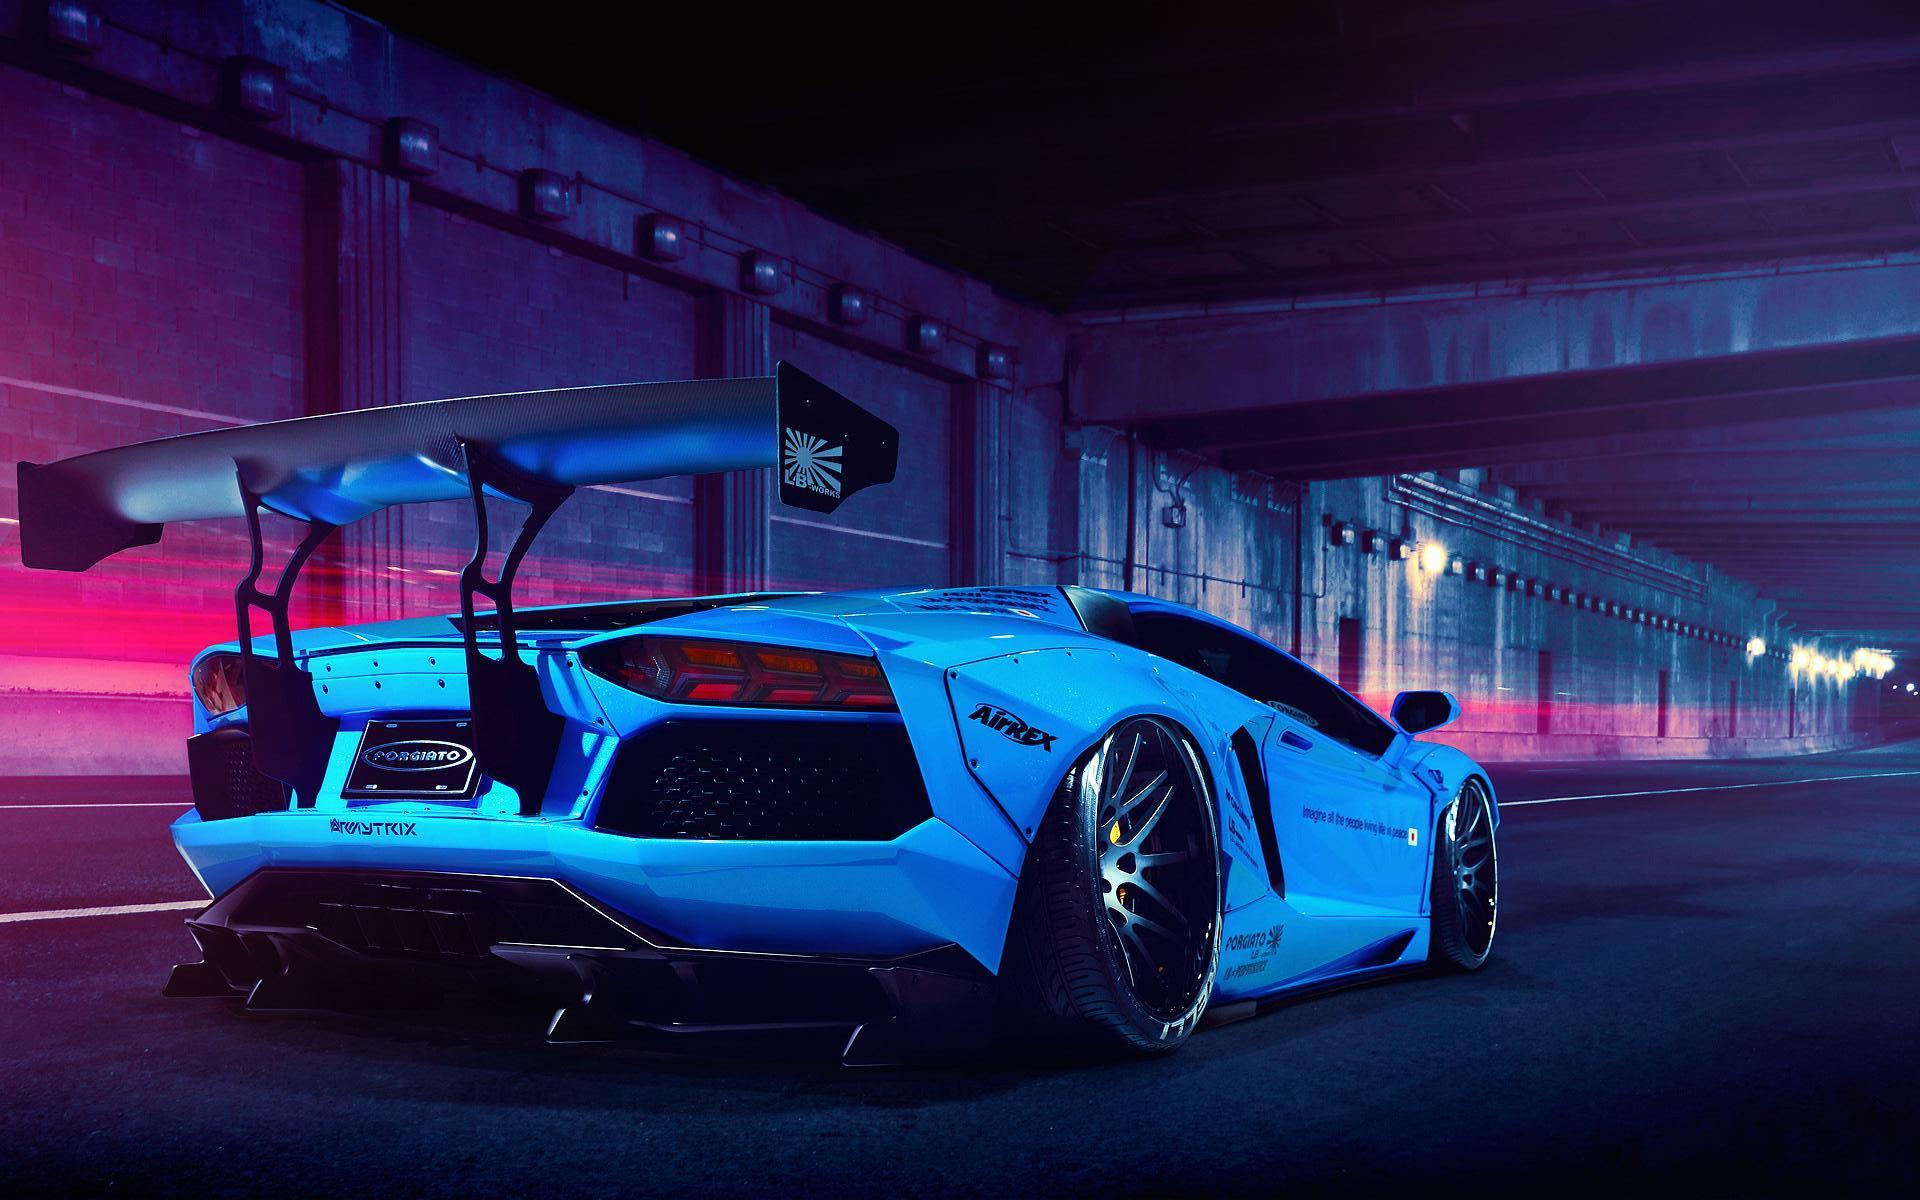 Blue Lamborghini Wallpapers - Wallpaper Cave